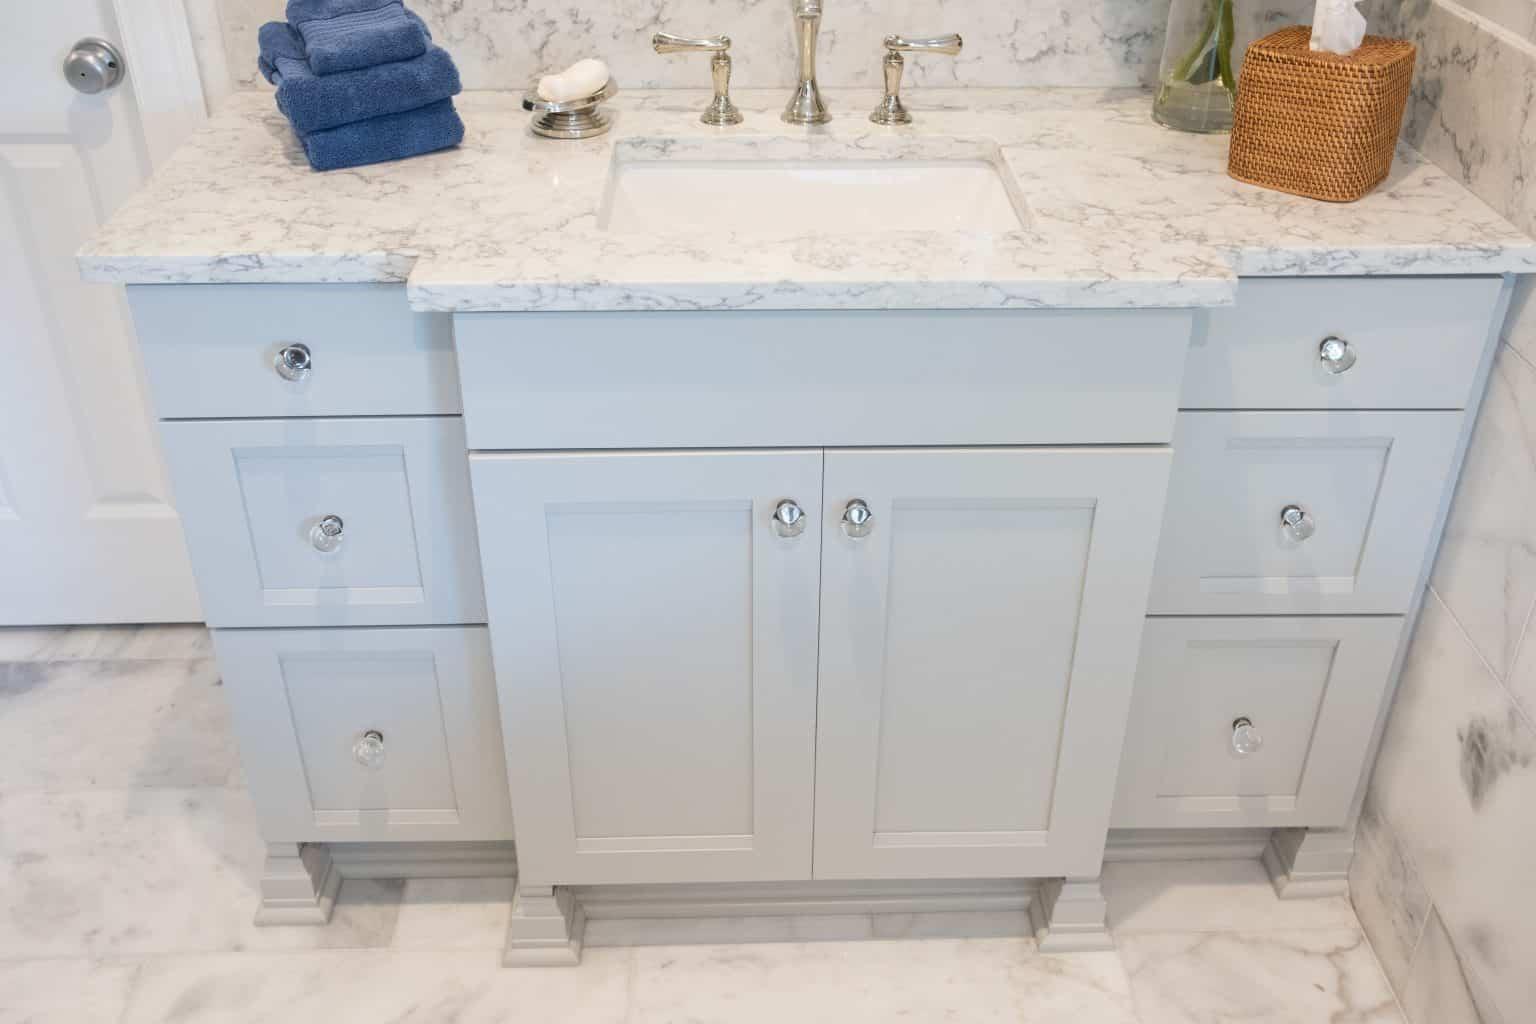 Standard Kitchen & Bath | Showplace Gun Smoke Grey Master Bathroom ...